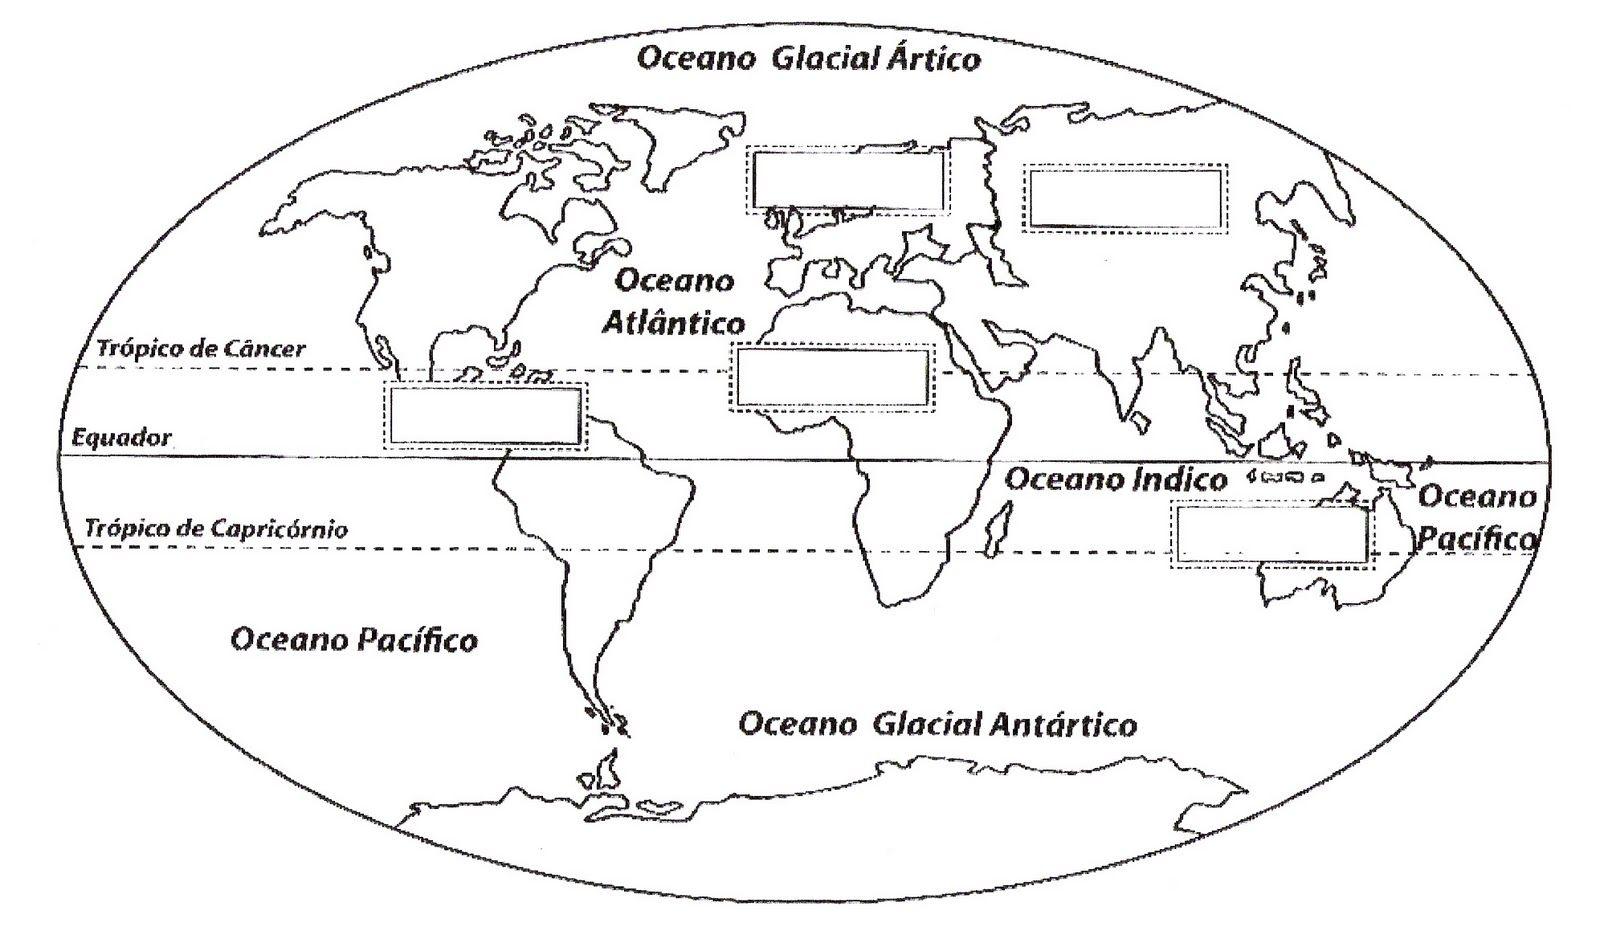 Pin De Edna Em His Geo 1 B Mapa Mundi Para Colorir Atividades